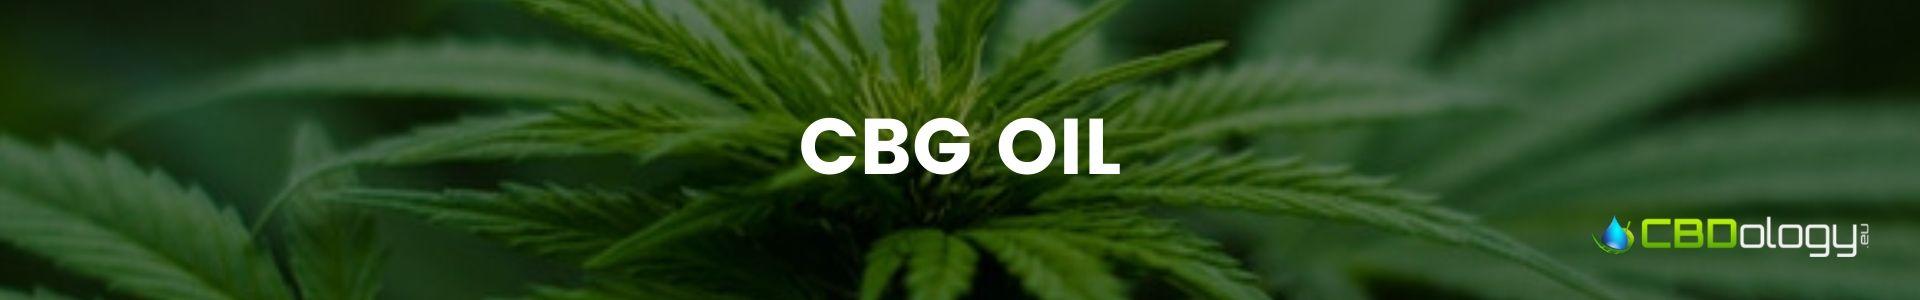 CBG Oil